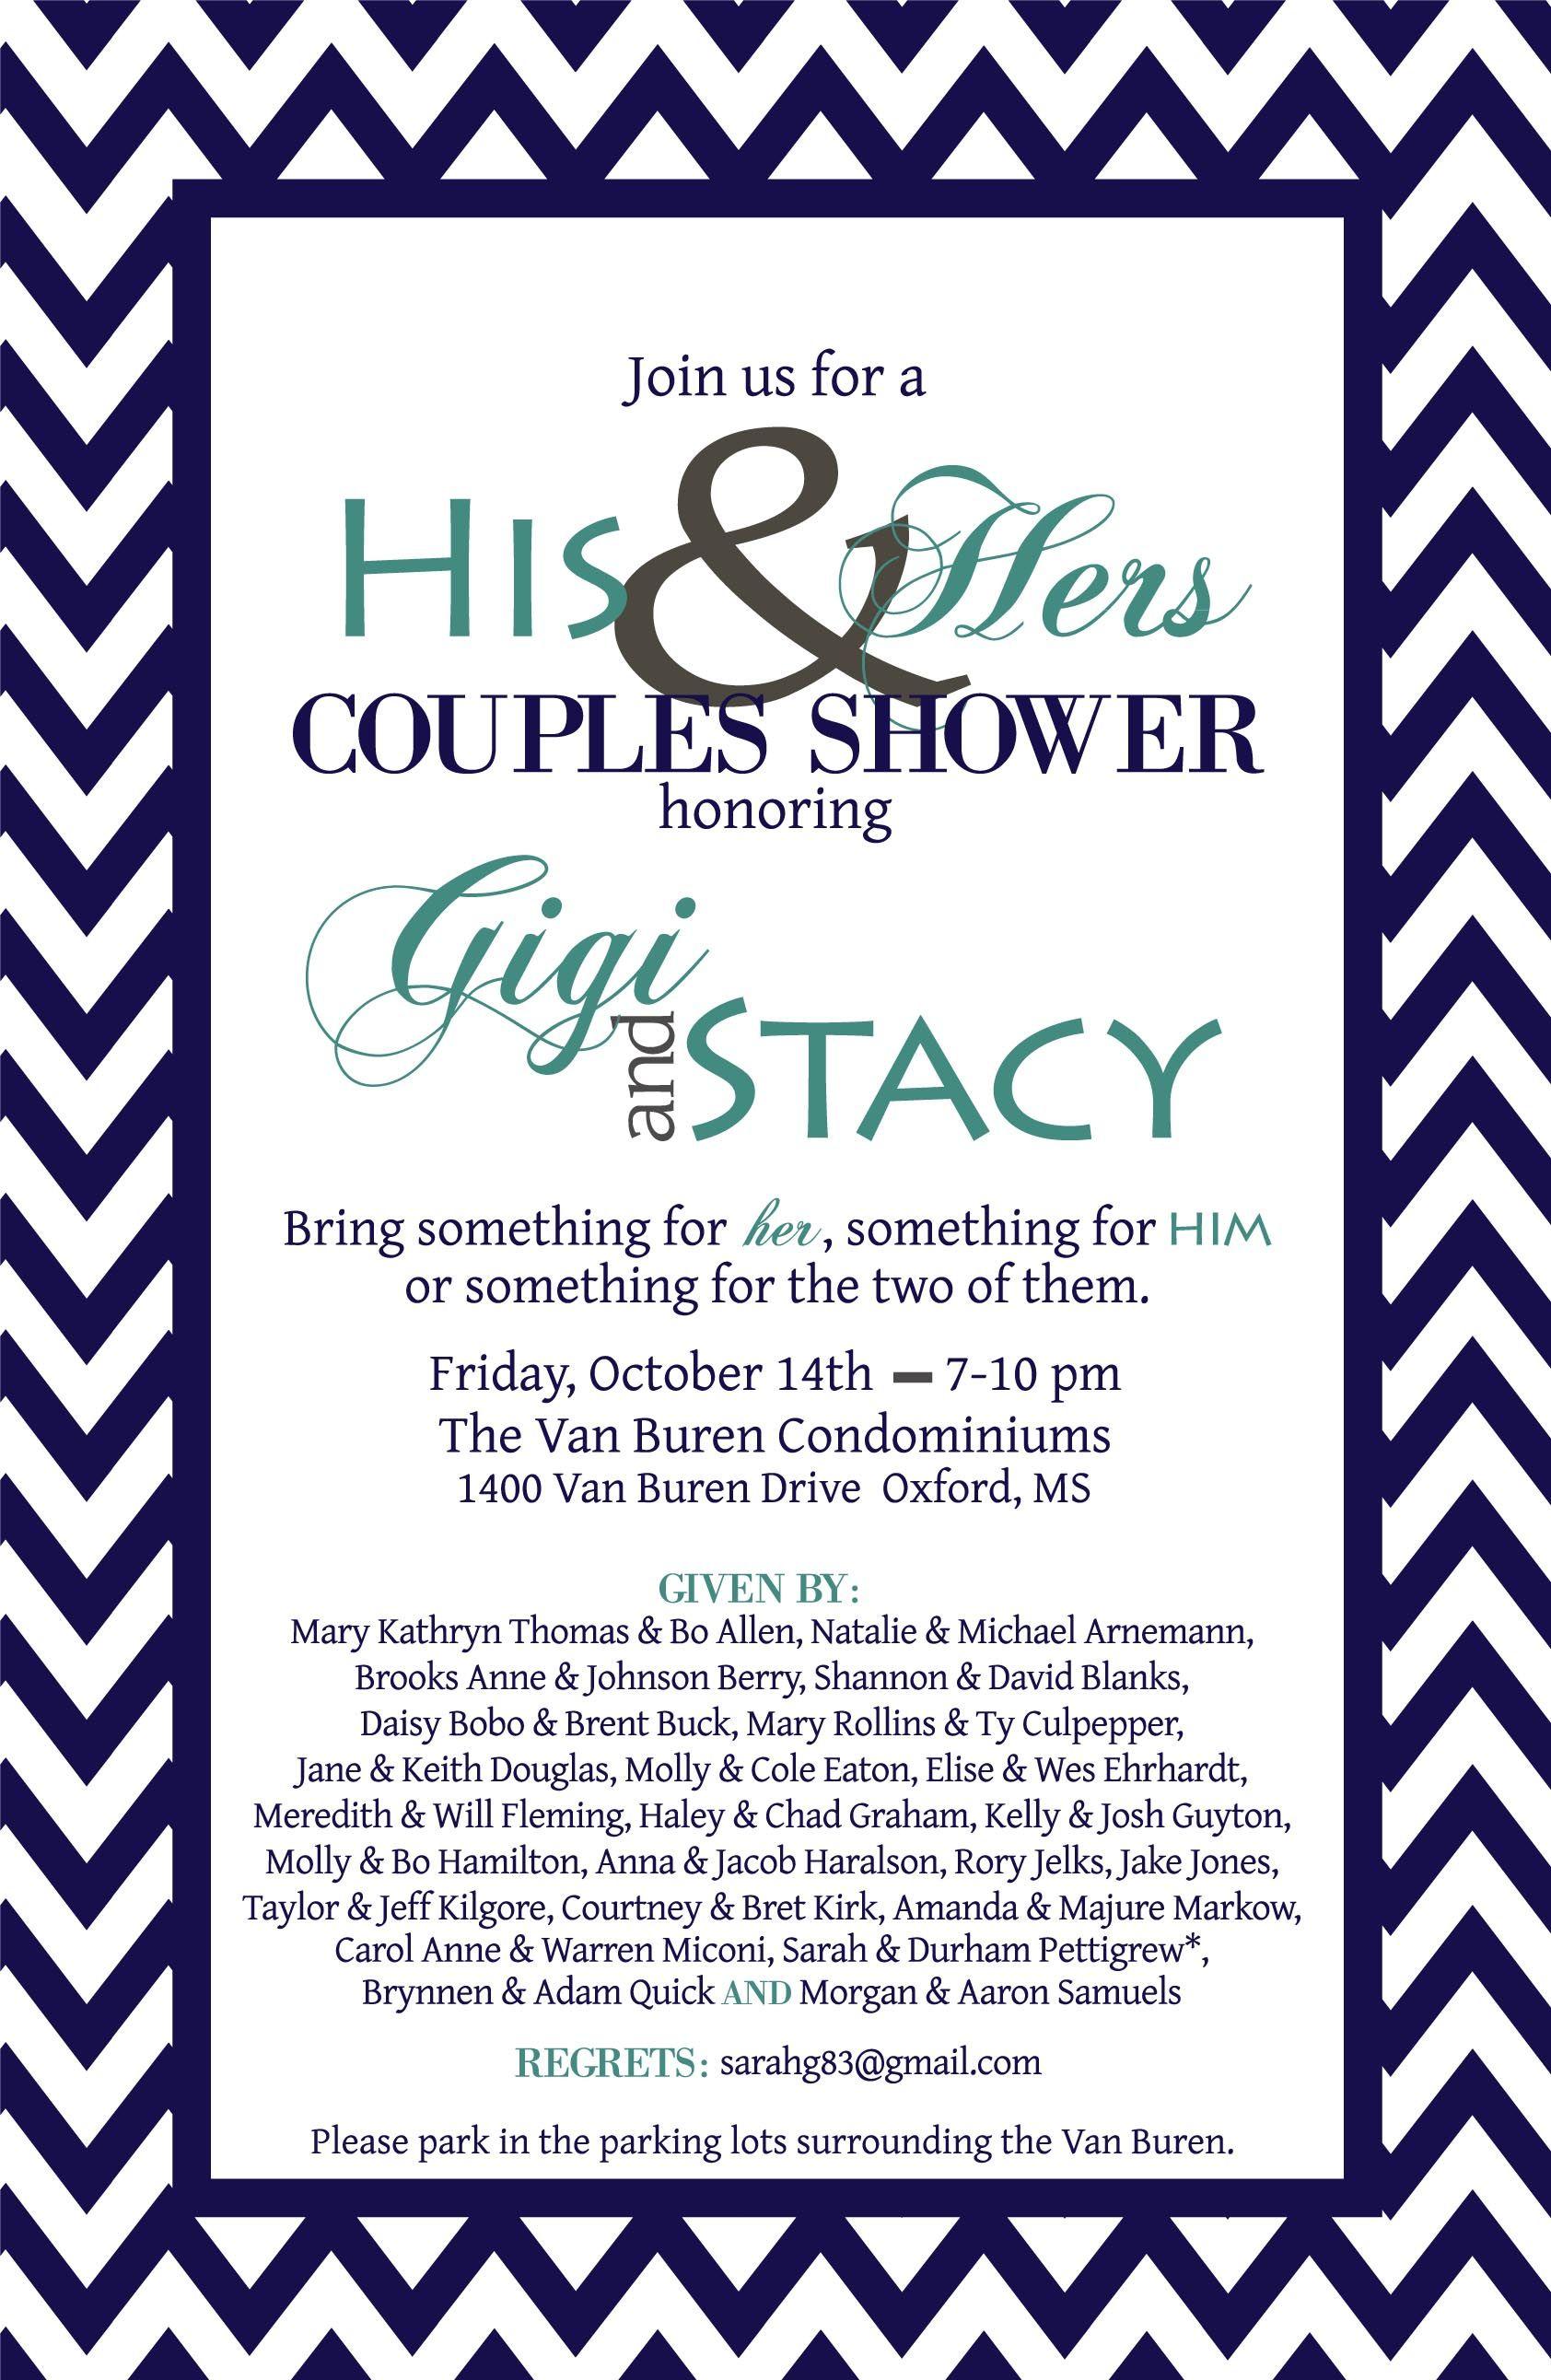 Couples wedding shower invitation wedding ideas pinterest for Wedding couples shower invitations